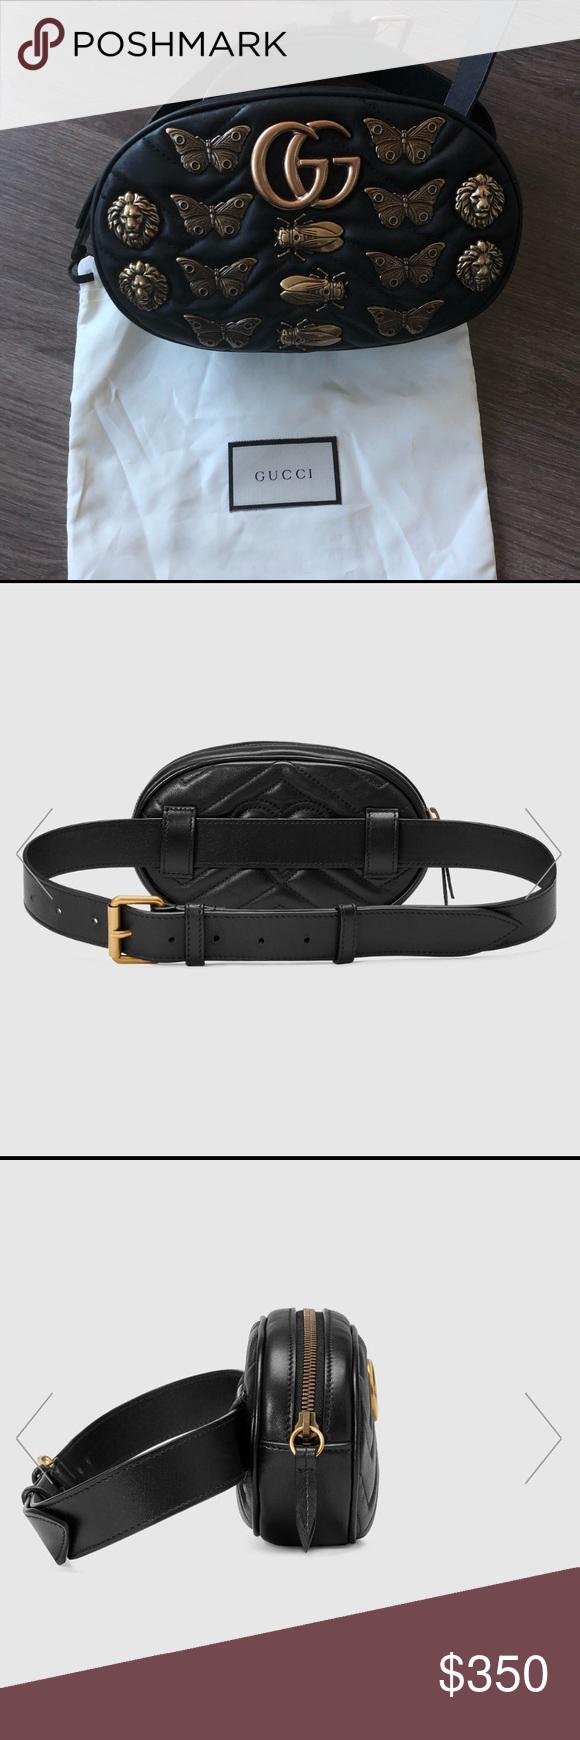 8337f9478d11 Gucci Fanny pack Gucci Fanny pack- GG Marmont matelassé leather belt bag  Gucci Bags Backpacks